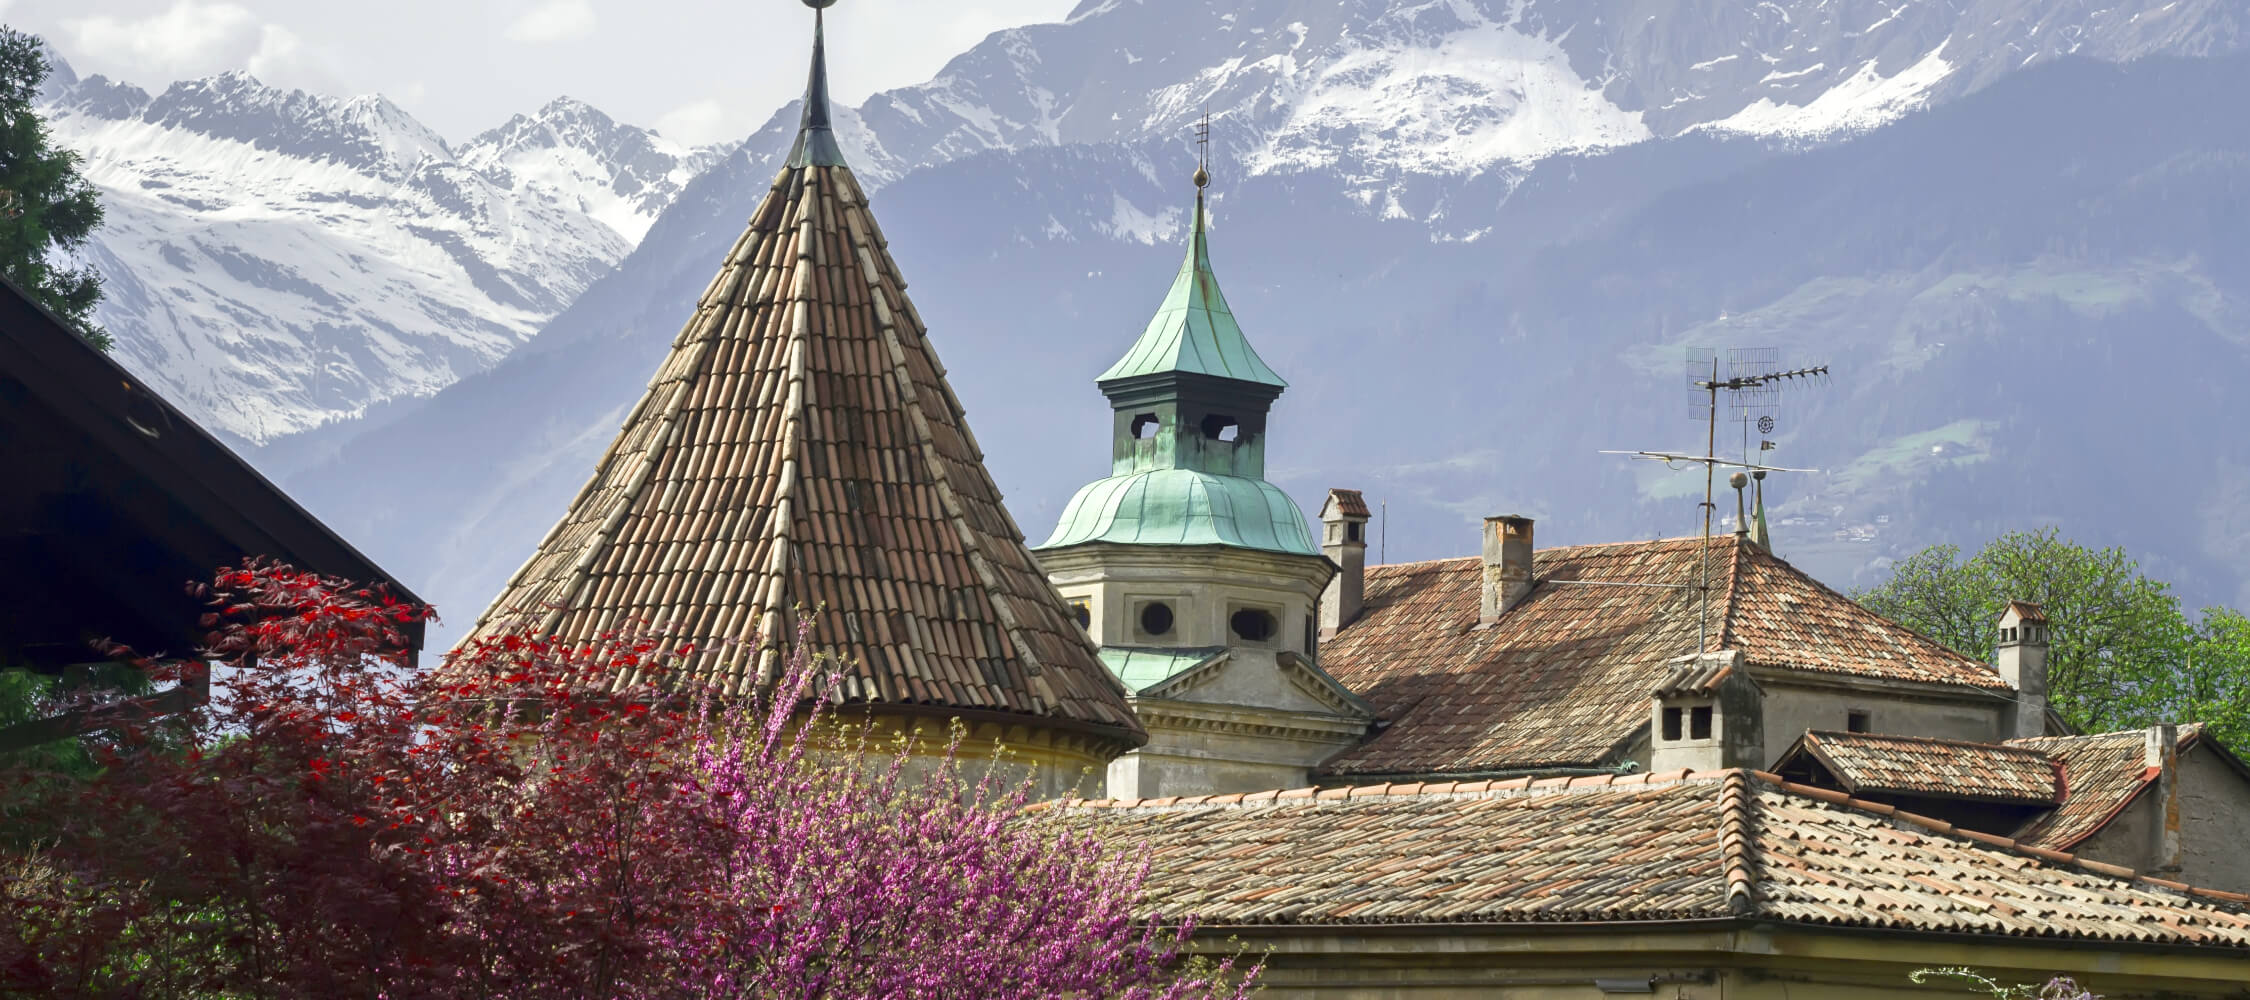 Italien-Trentino_Suedtirol_Alto_Adige_Merano_Meran_Stadt_Altstadt_Panorama_Berge_Haus_Winter_Fruehling_93645164_2250x1000